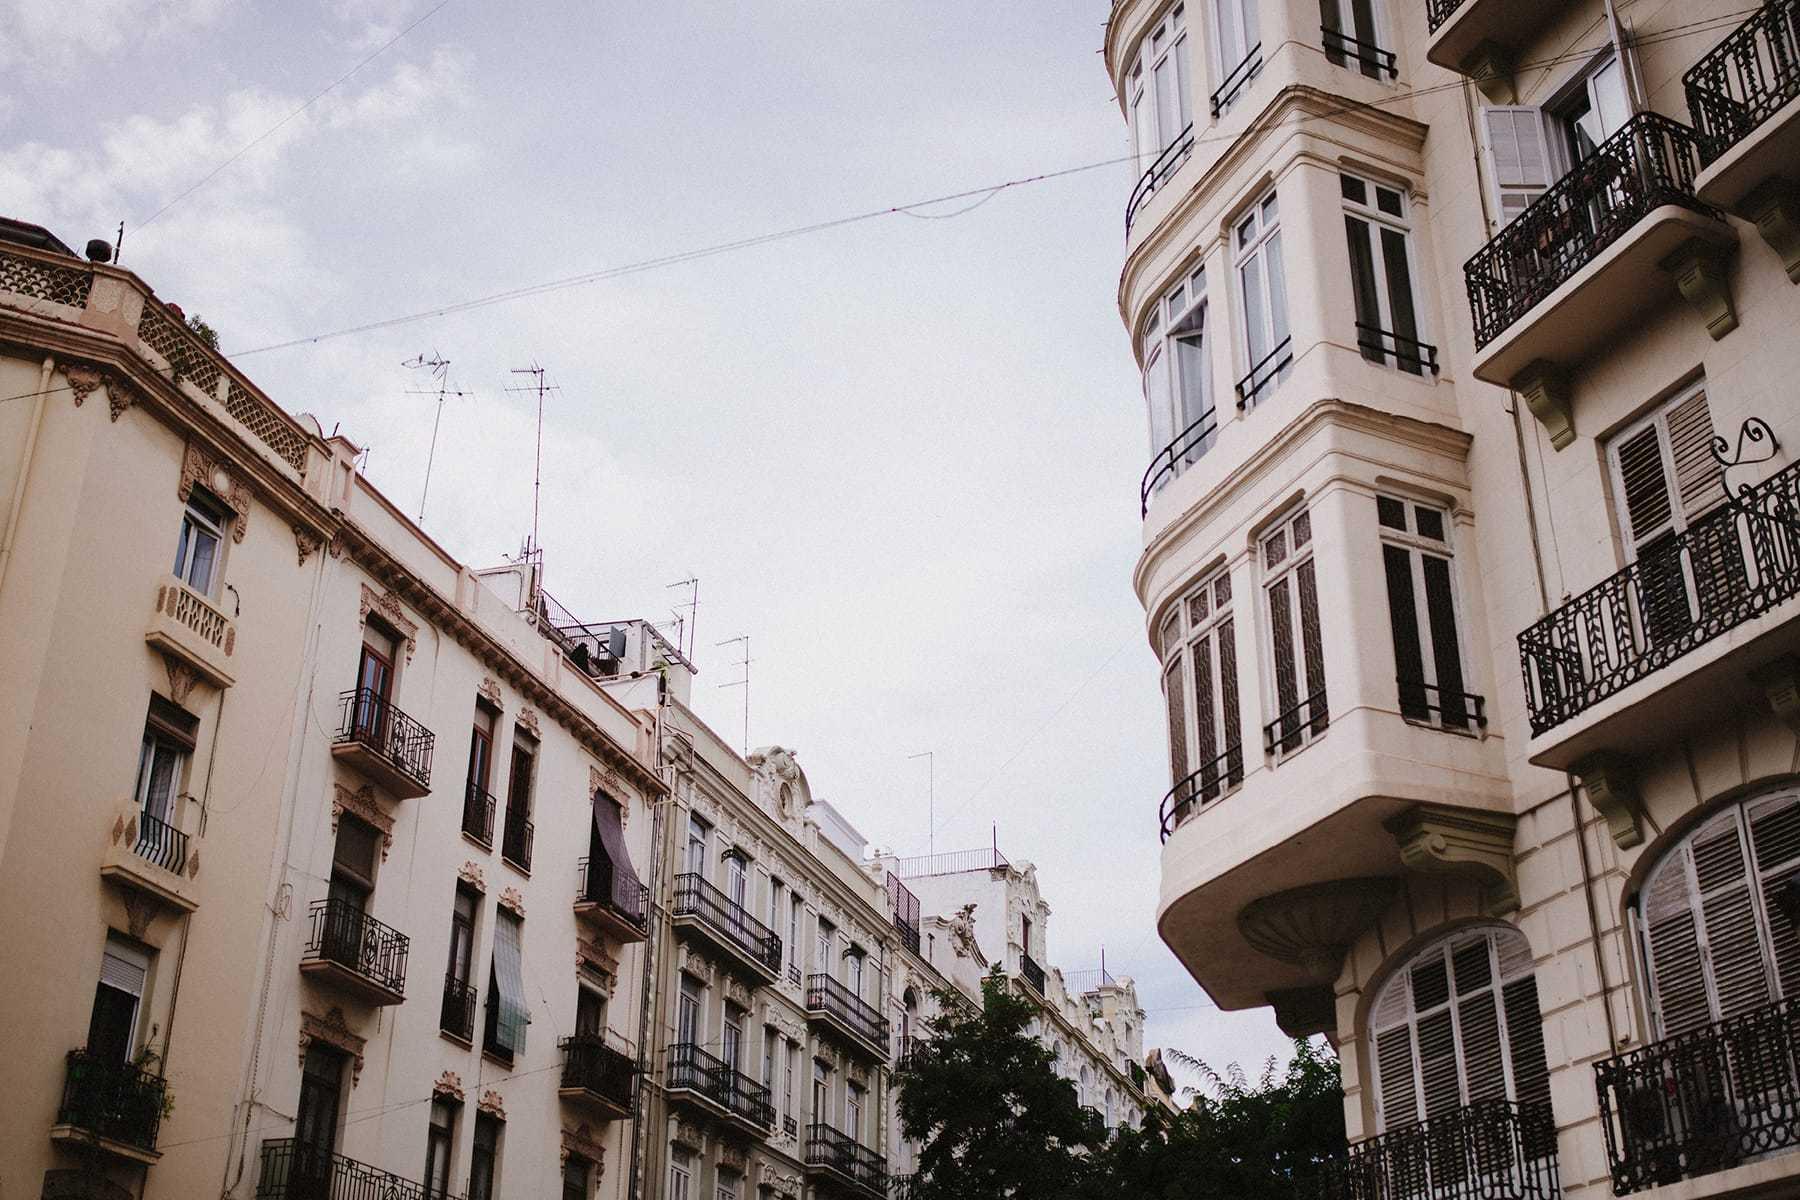 masia_campo_anibal_hilario_sanchez_fotografo_boda_valencia_001